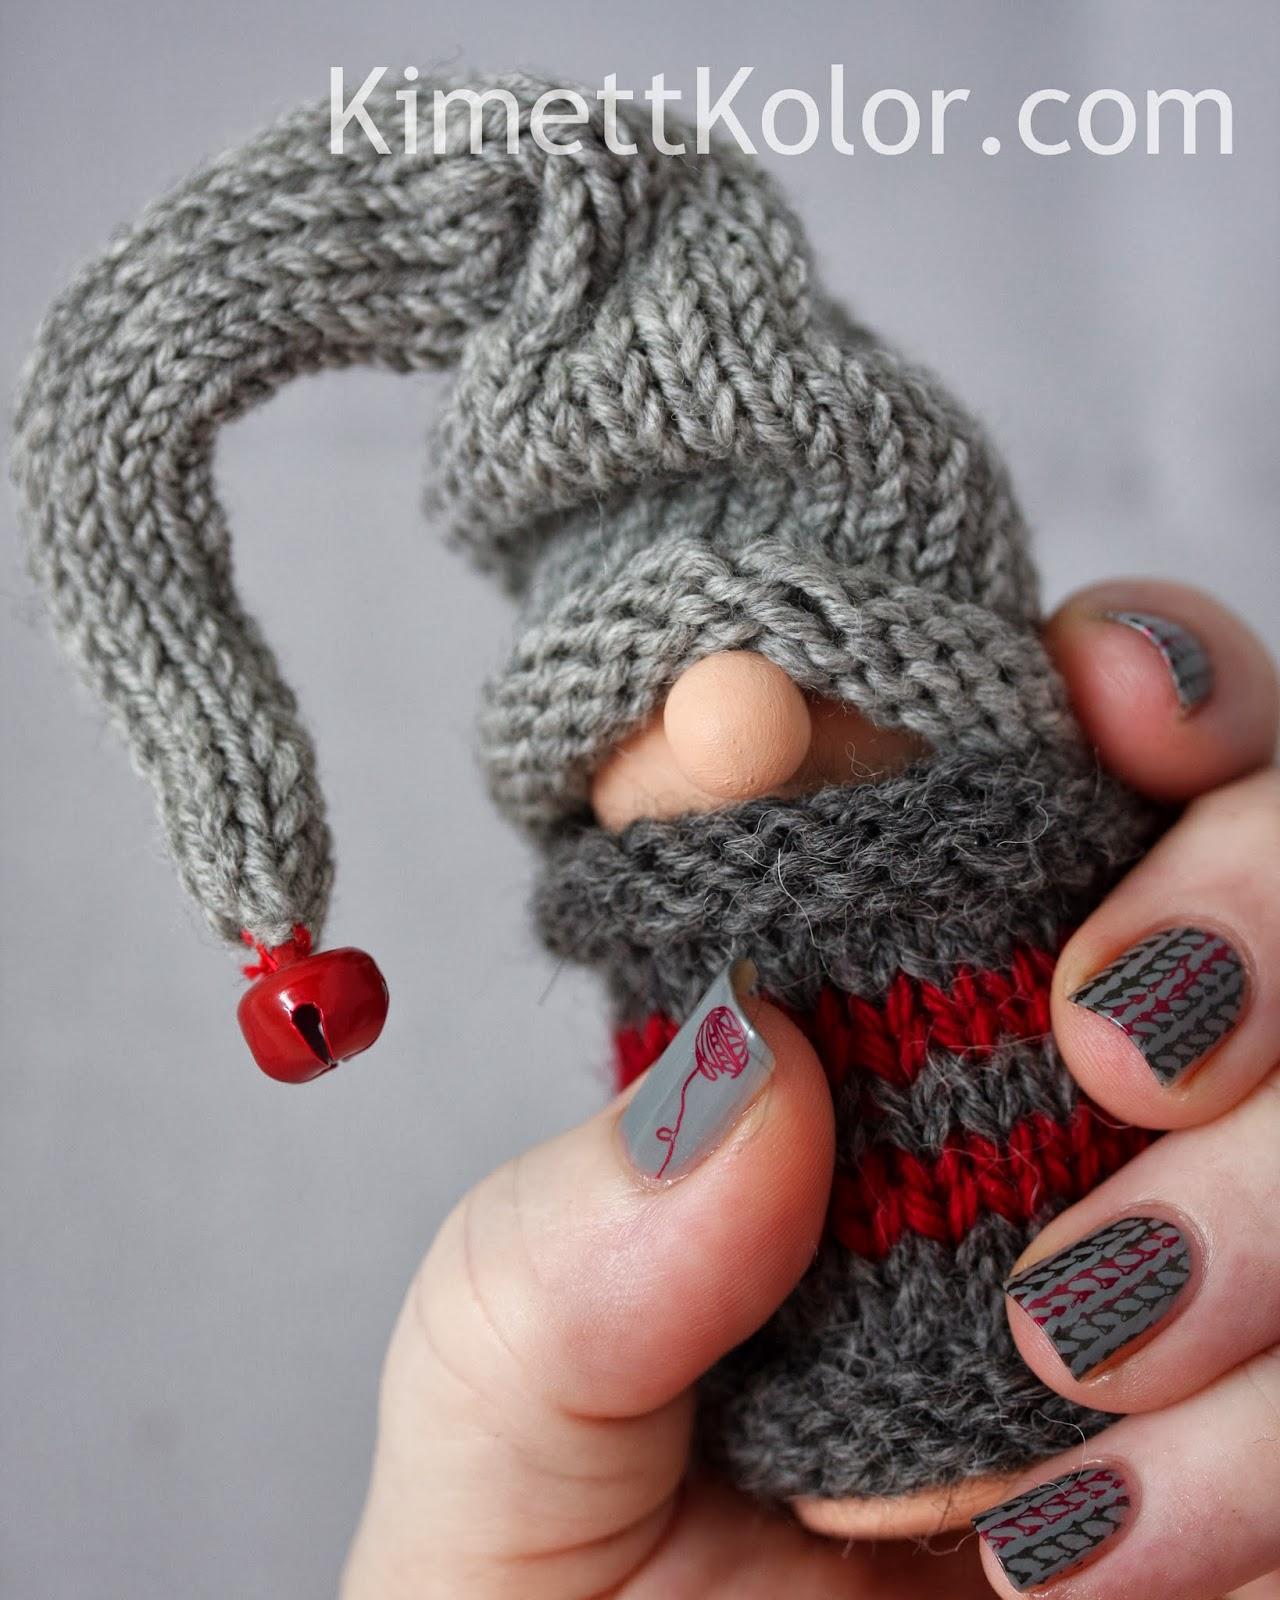 Gnome Knitting Pattern : Knitted Gnome Sweater Kimett Kolor